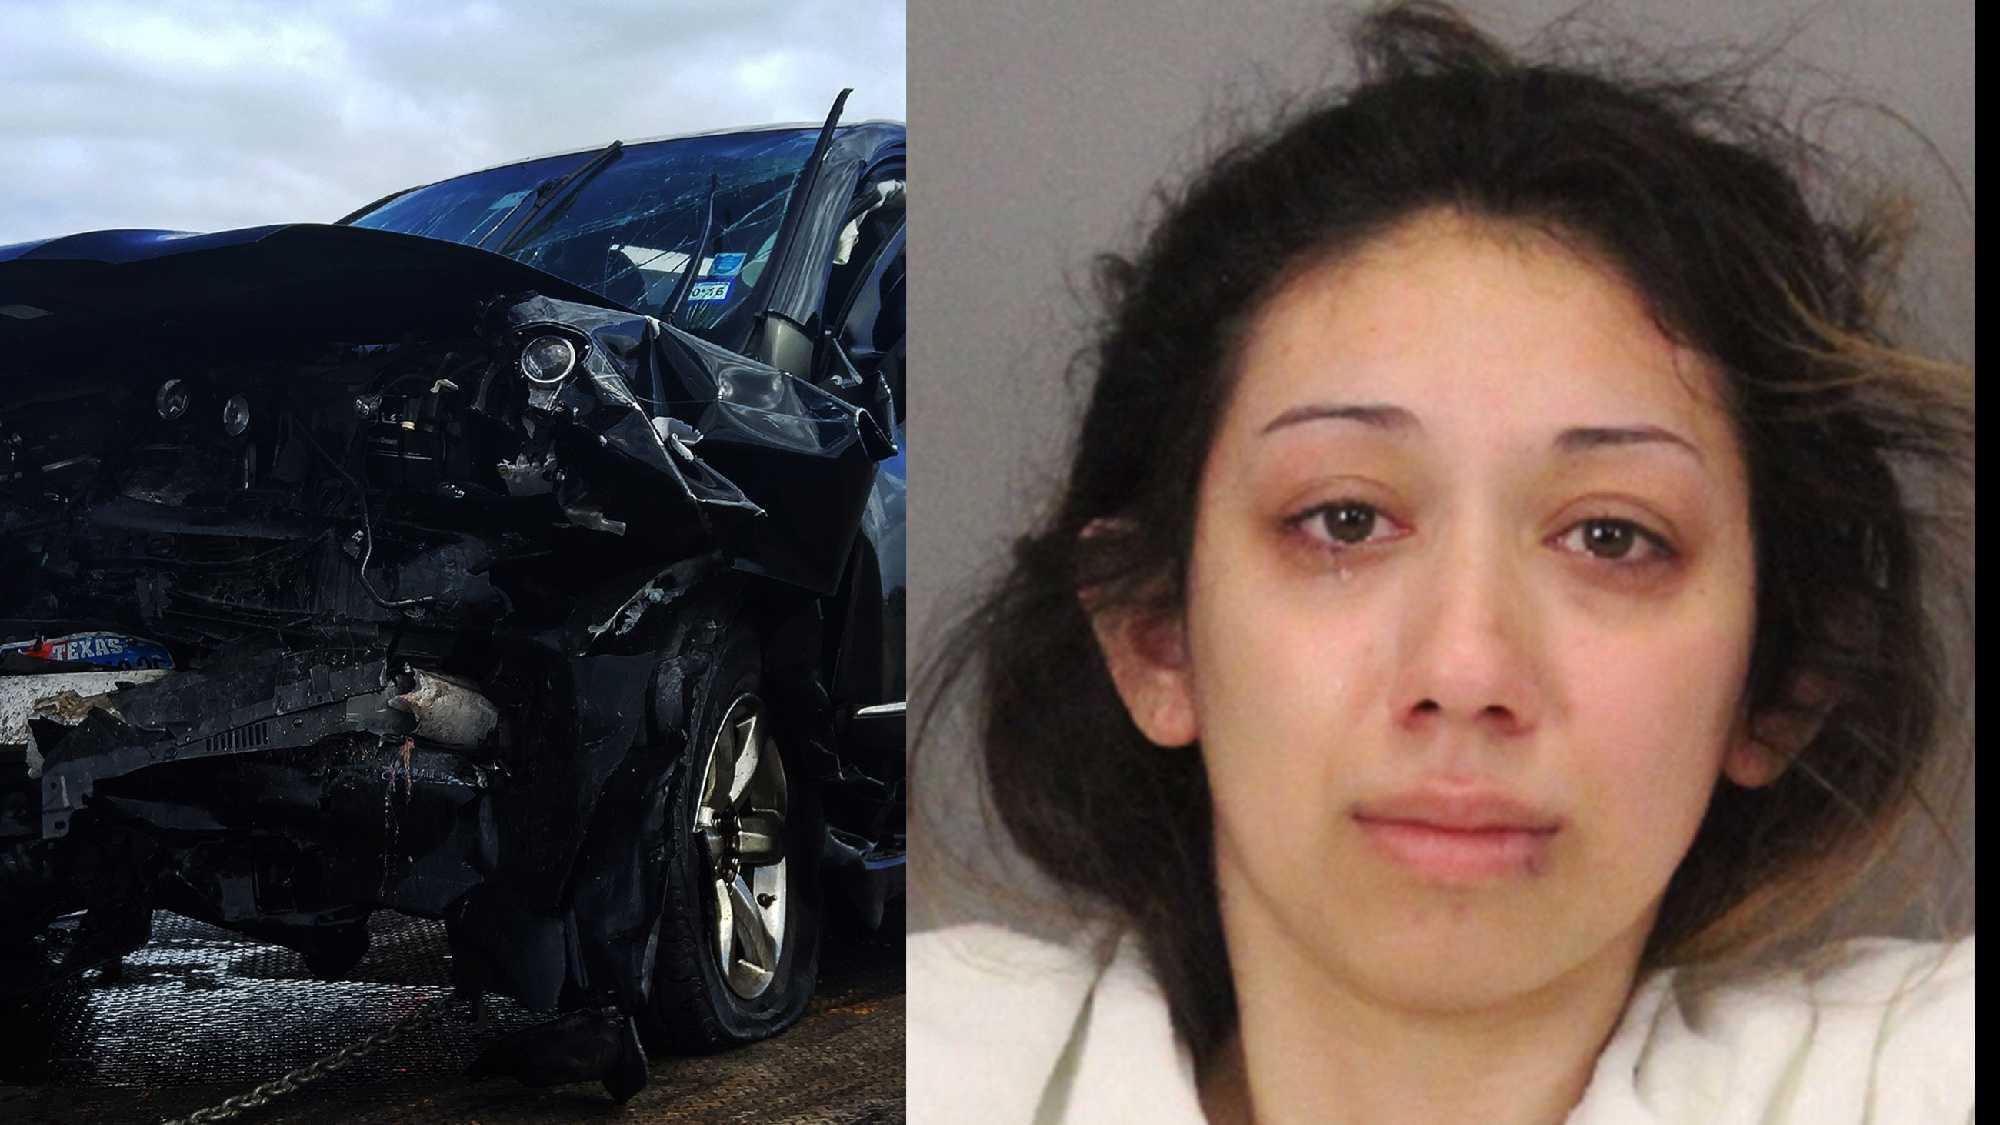 Lynnea Hernandez, 19, of Santa Cruz